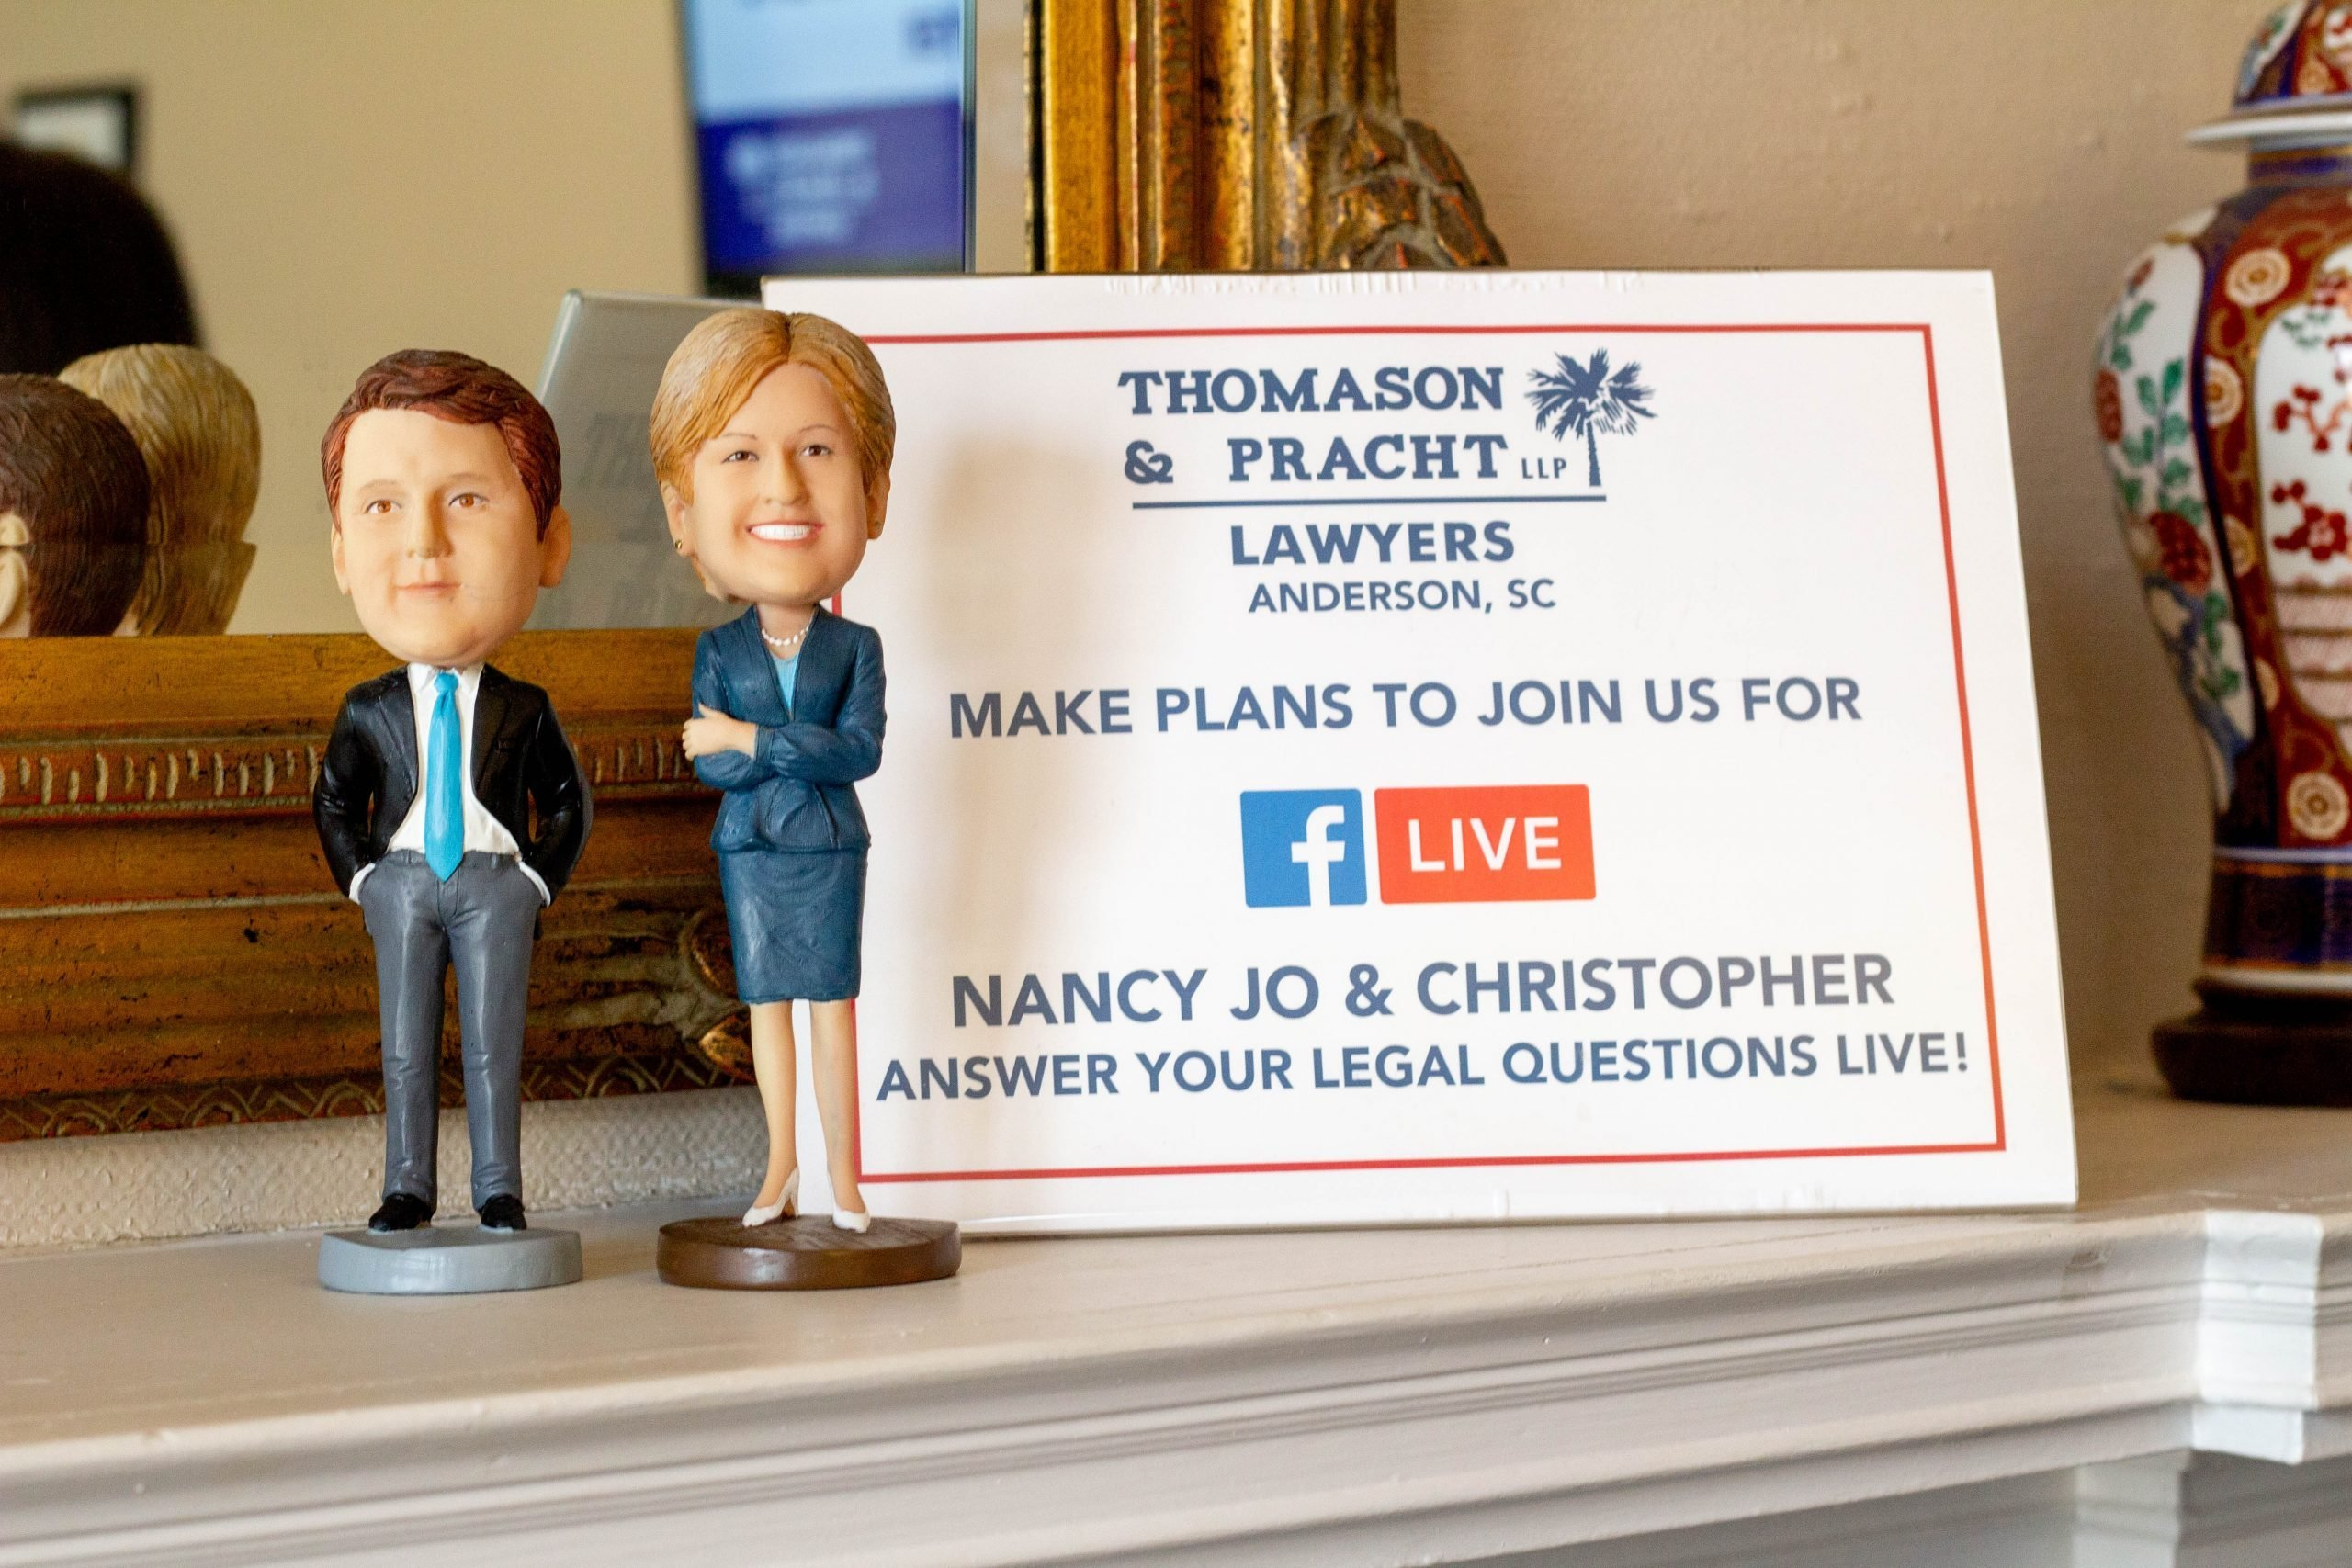 website design - Thomason and Pracht Lawyers